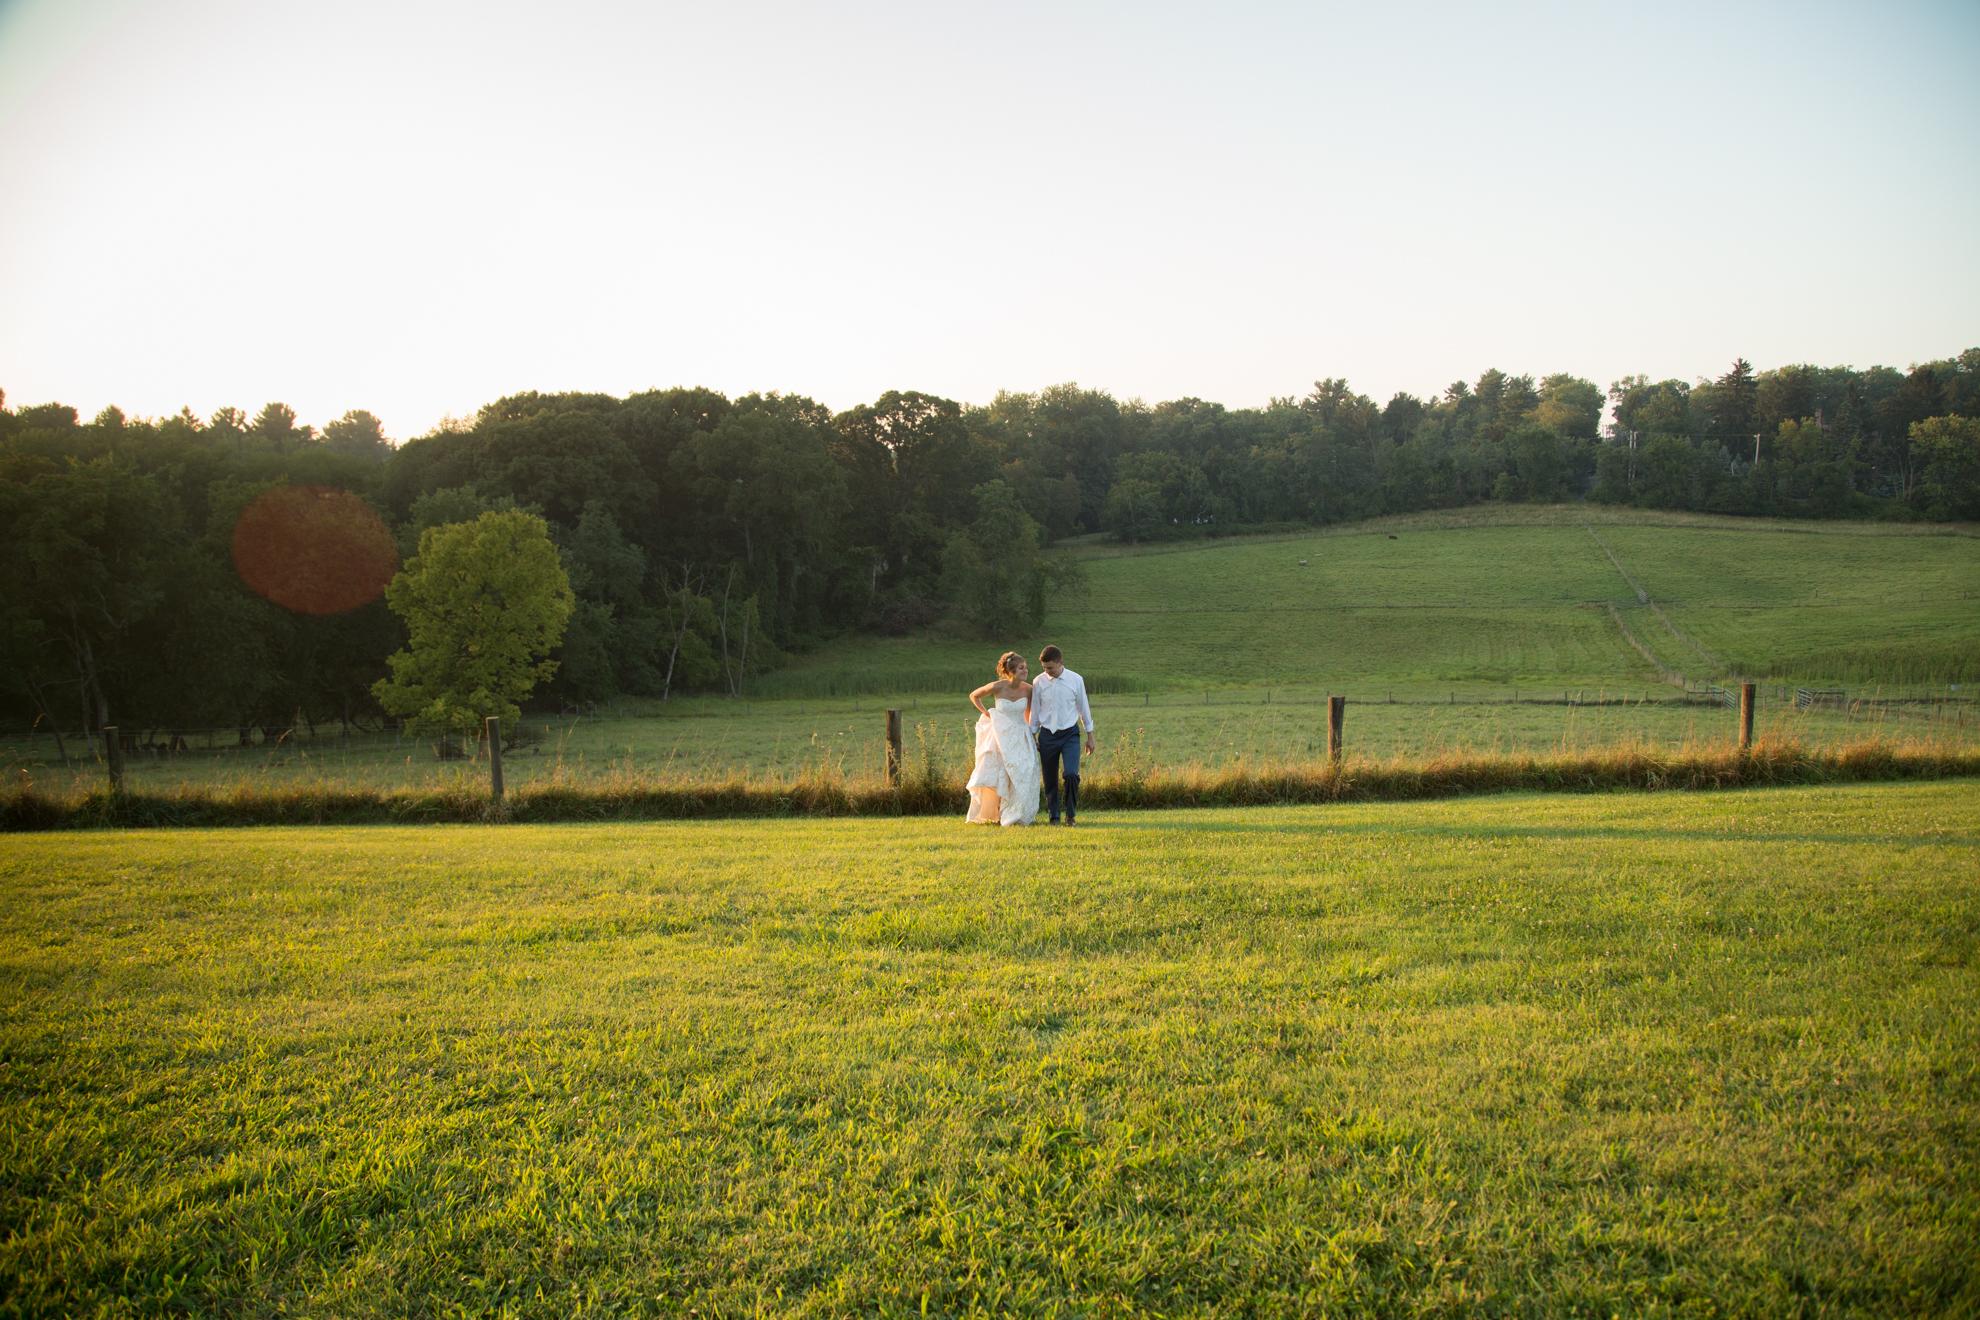 dundee-farm-wedding-sunset-portraits